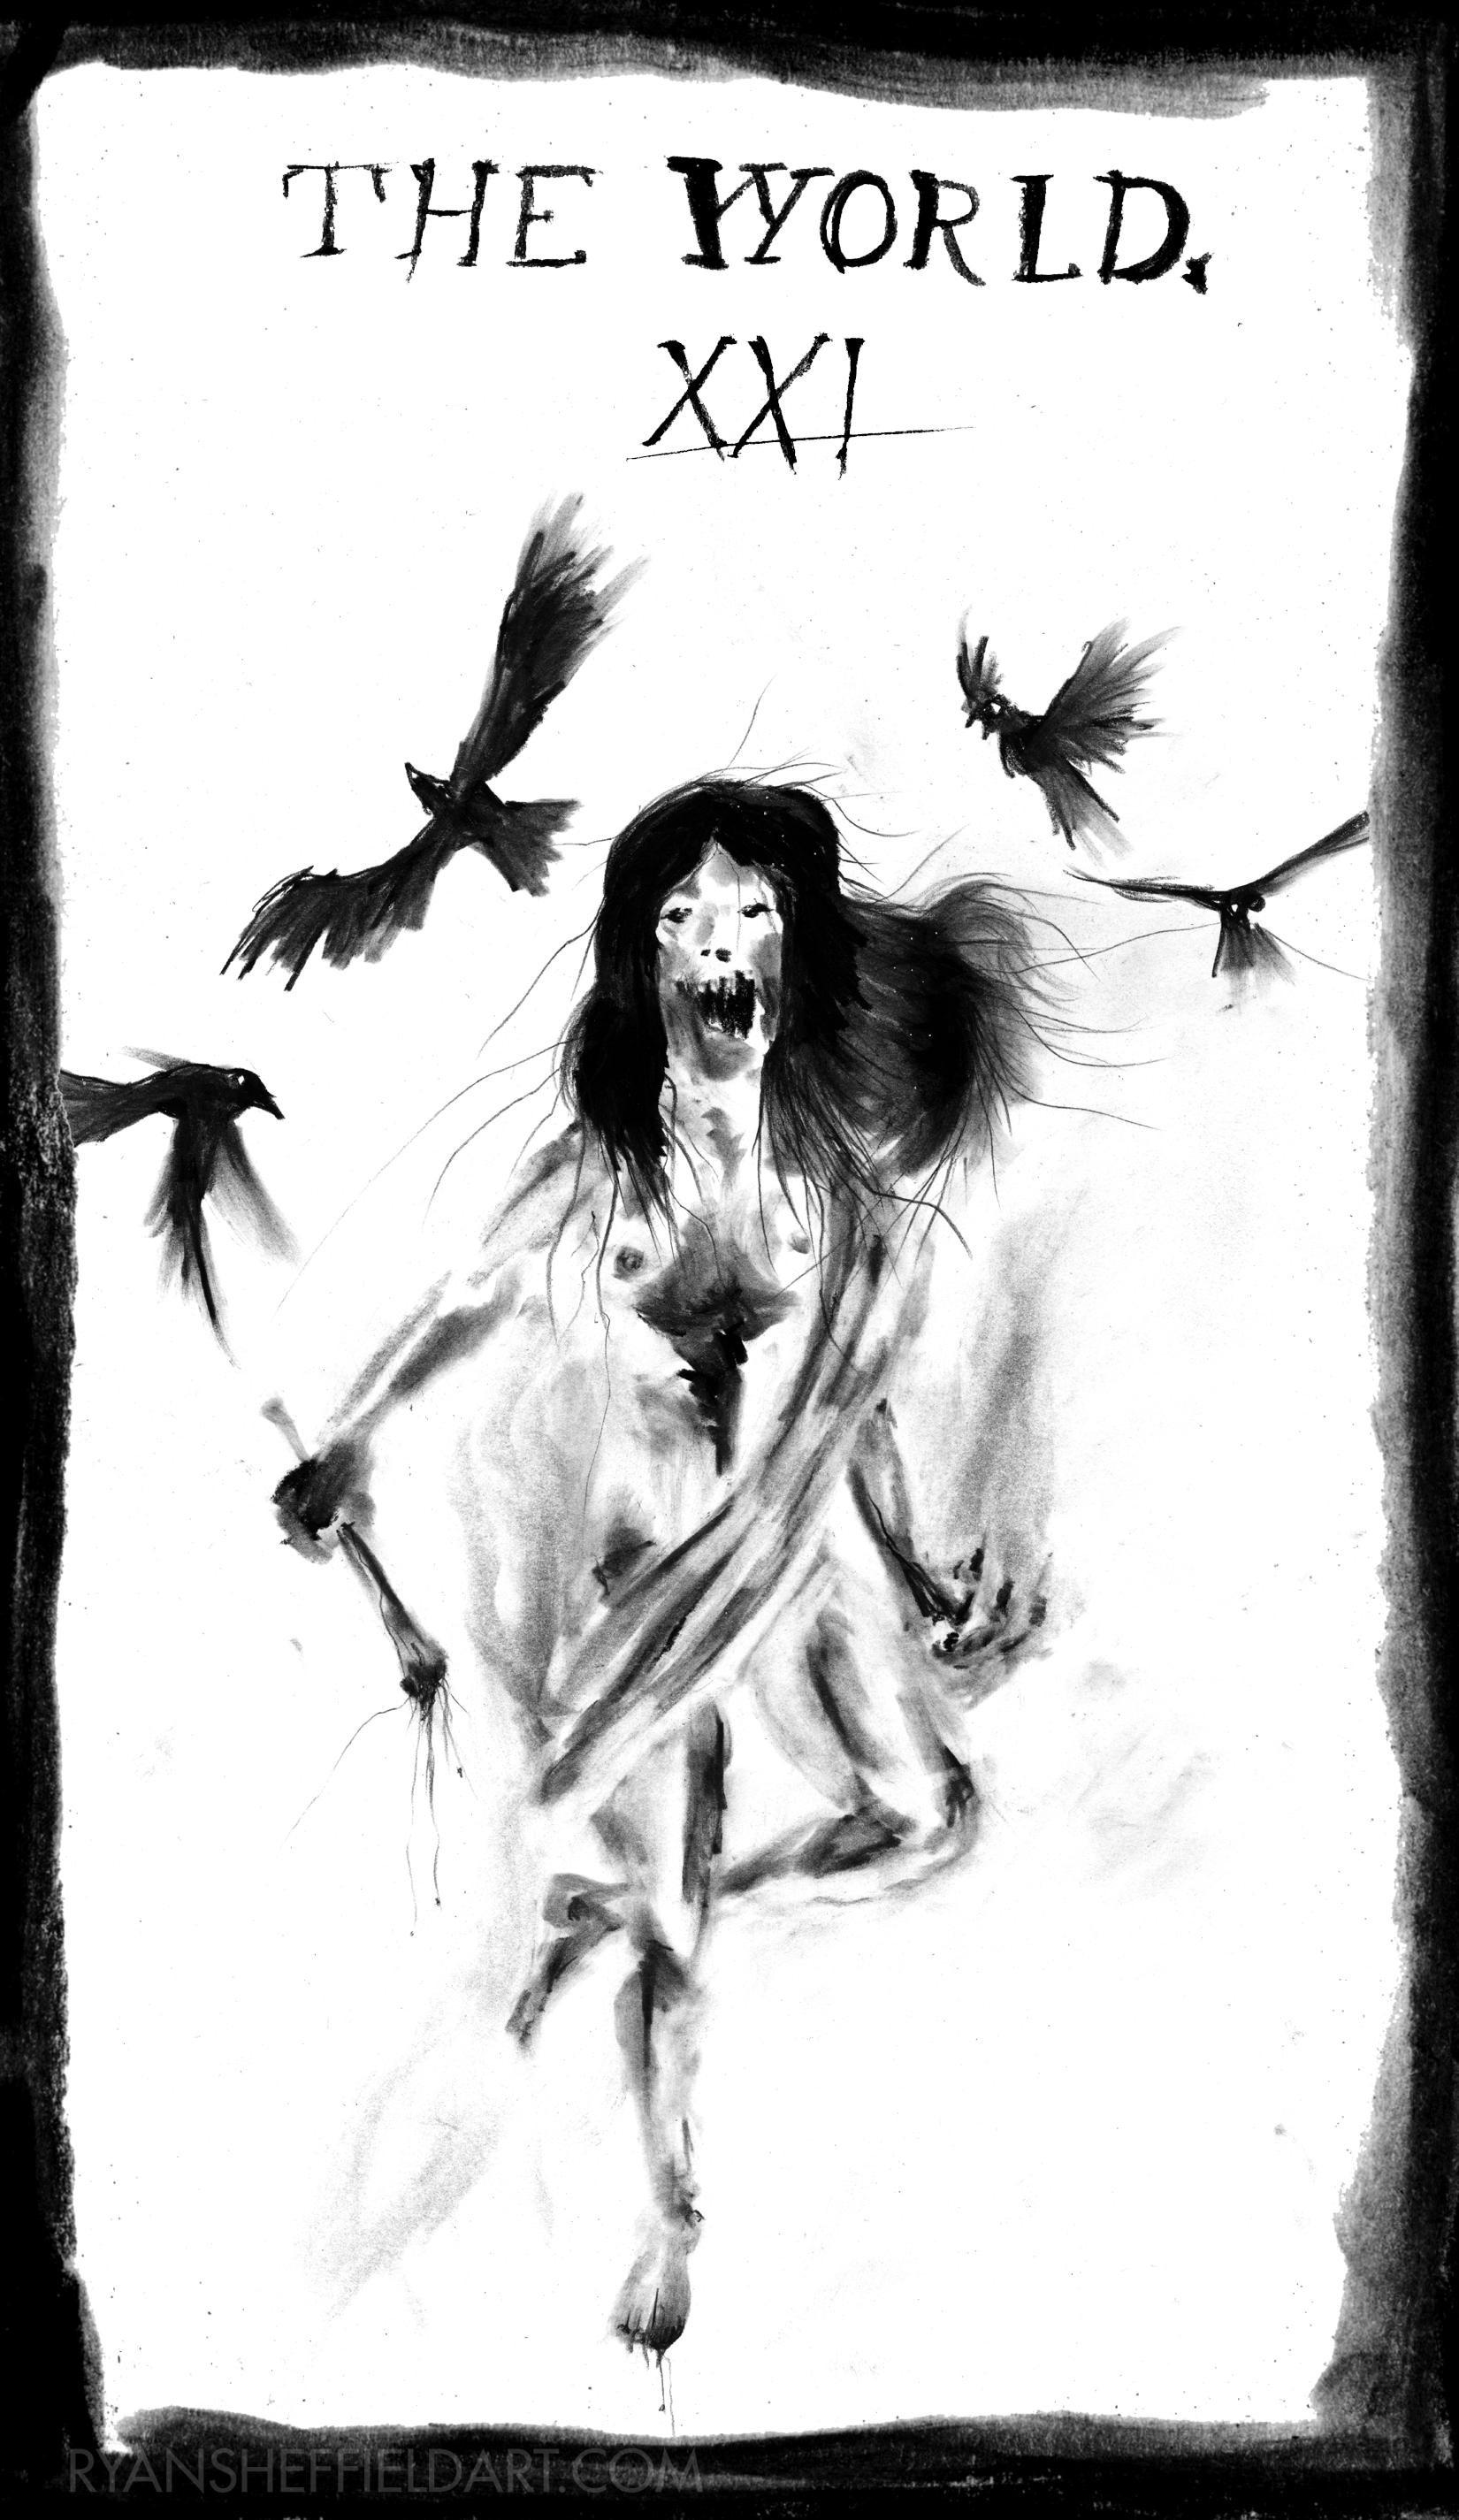 Ritual Abuse Tarot by Ryan Sheffield - Imgur